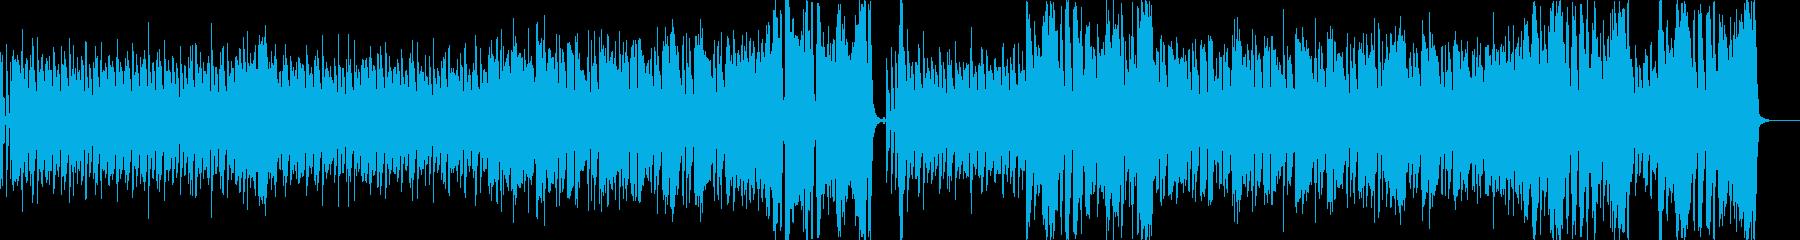 CLAVINET ファンク&ソウルの響きの再生済みの波形